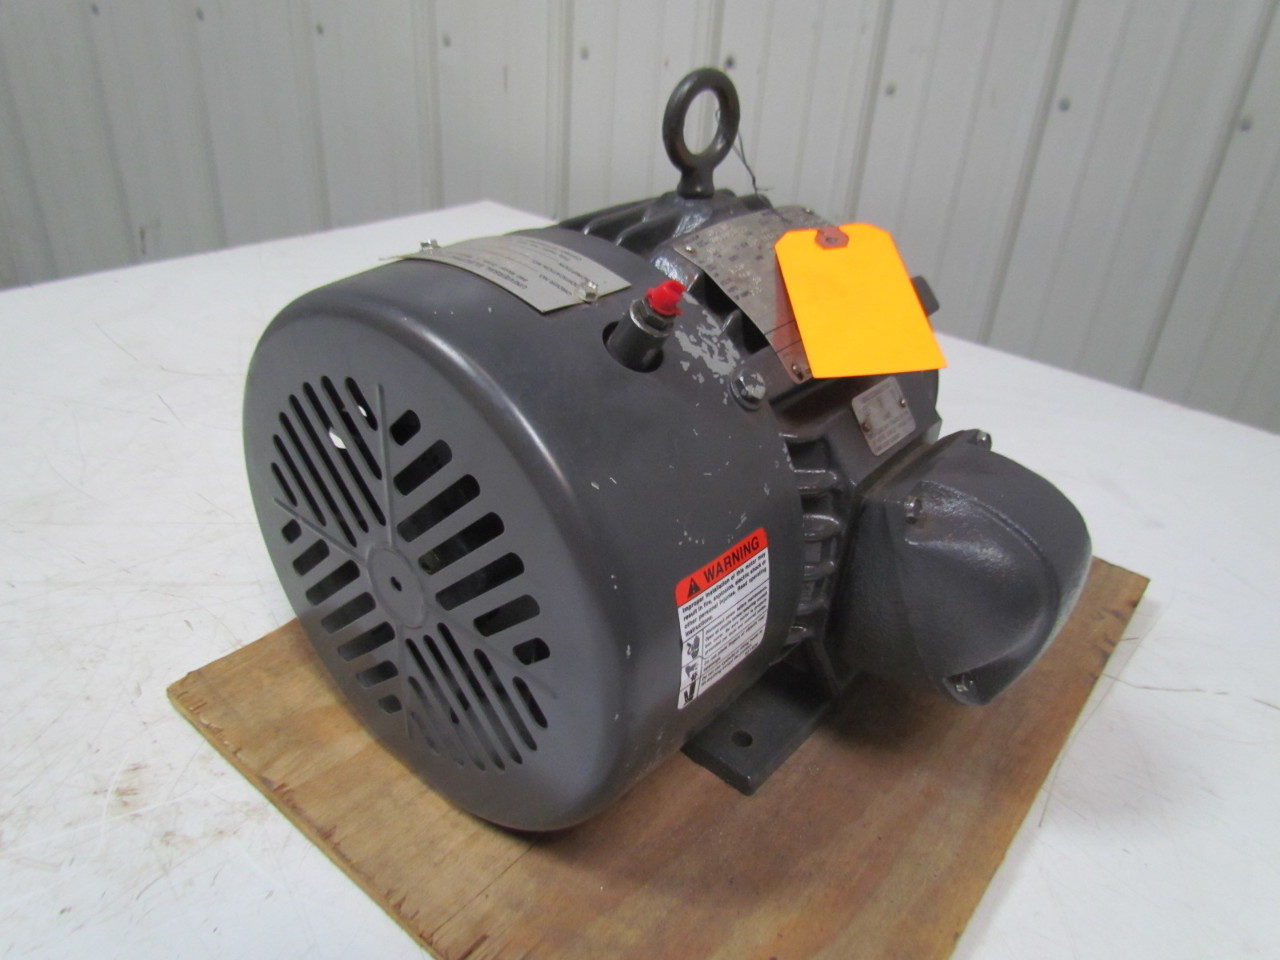 Emerson Us Motors A32p1c B654 1 5hp 3ph Electric Motor